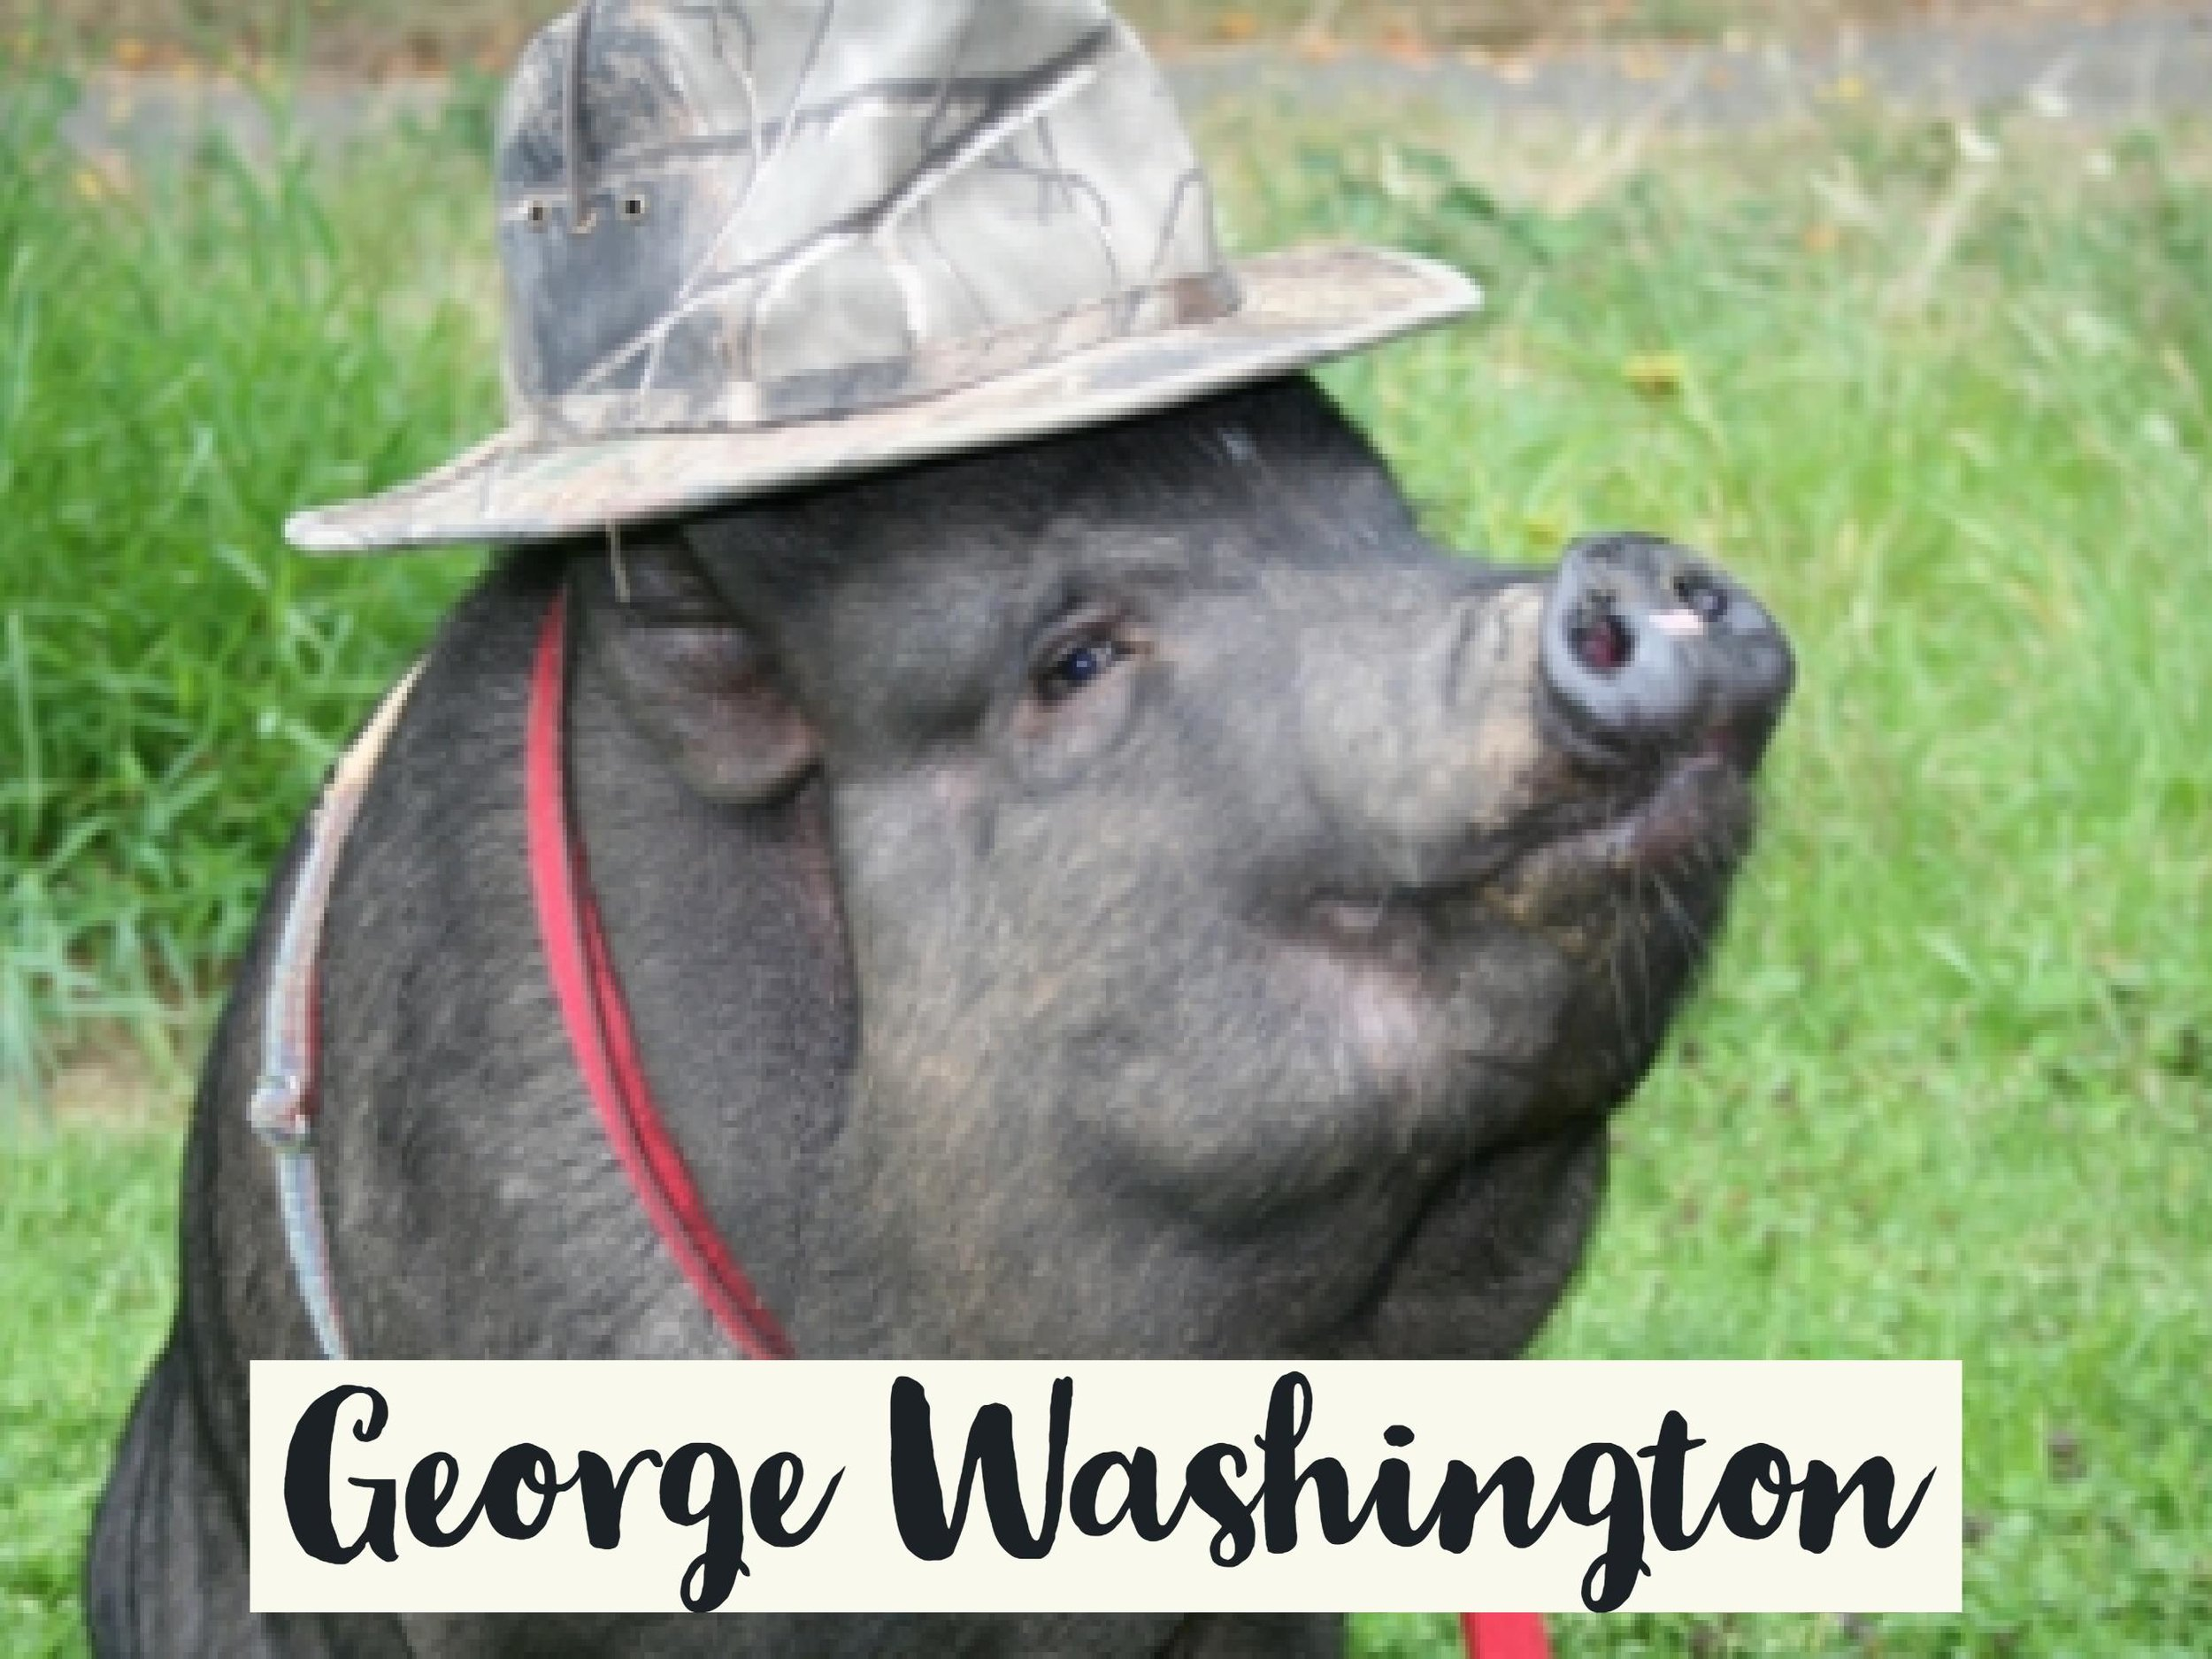 GeorgeWashington_WV17.jpg